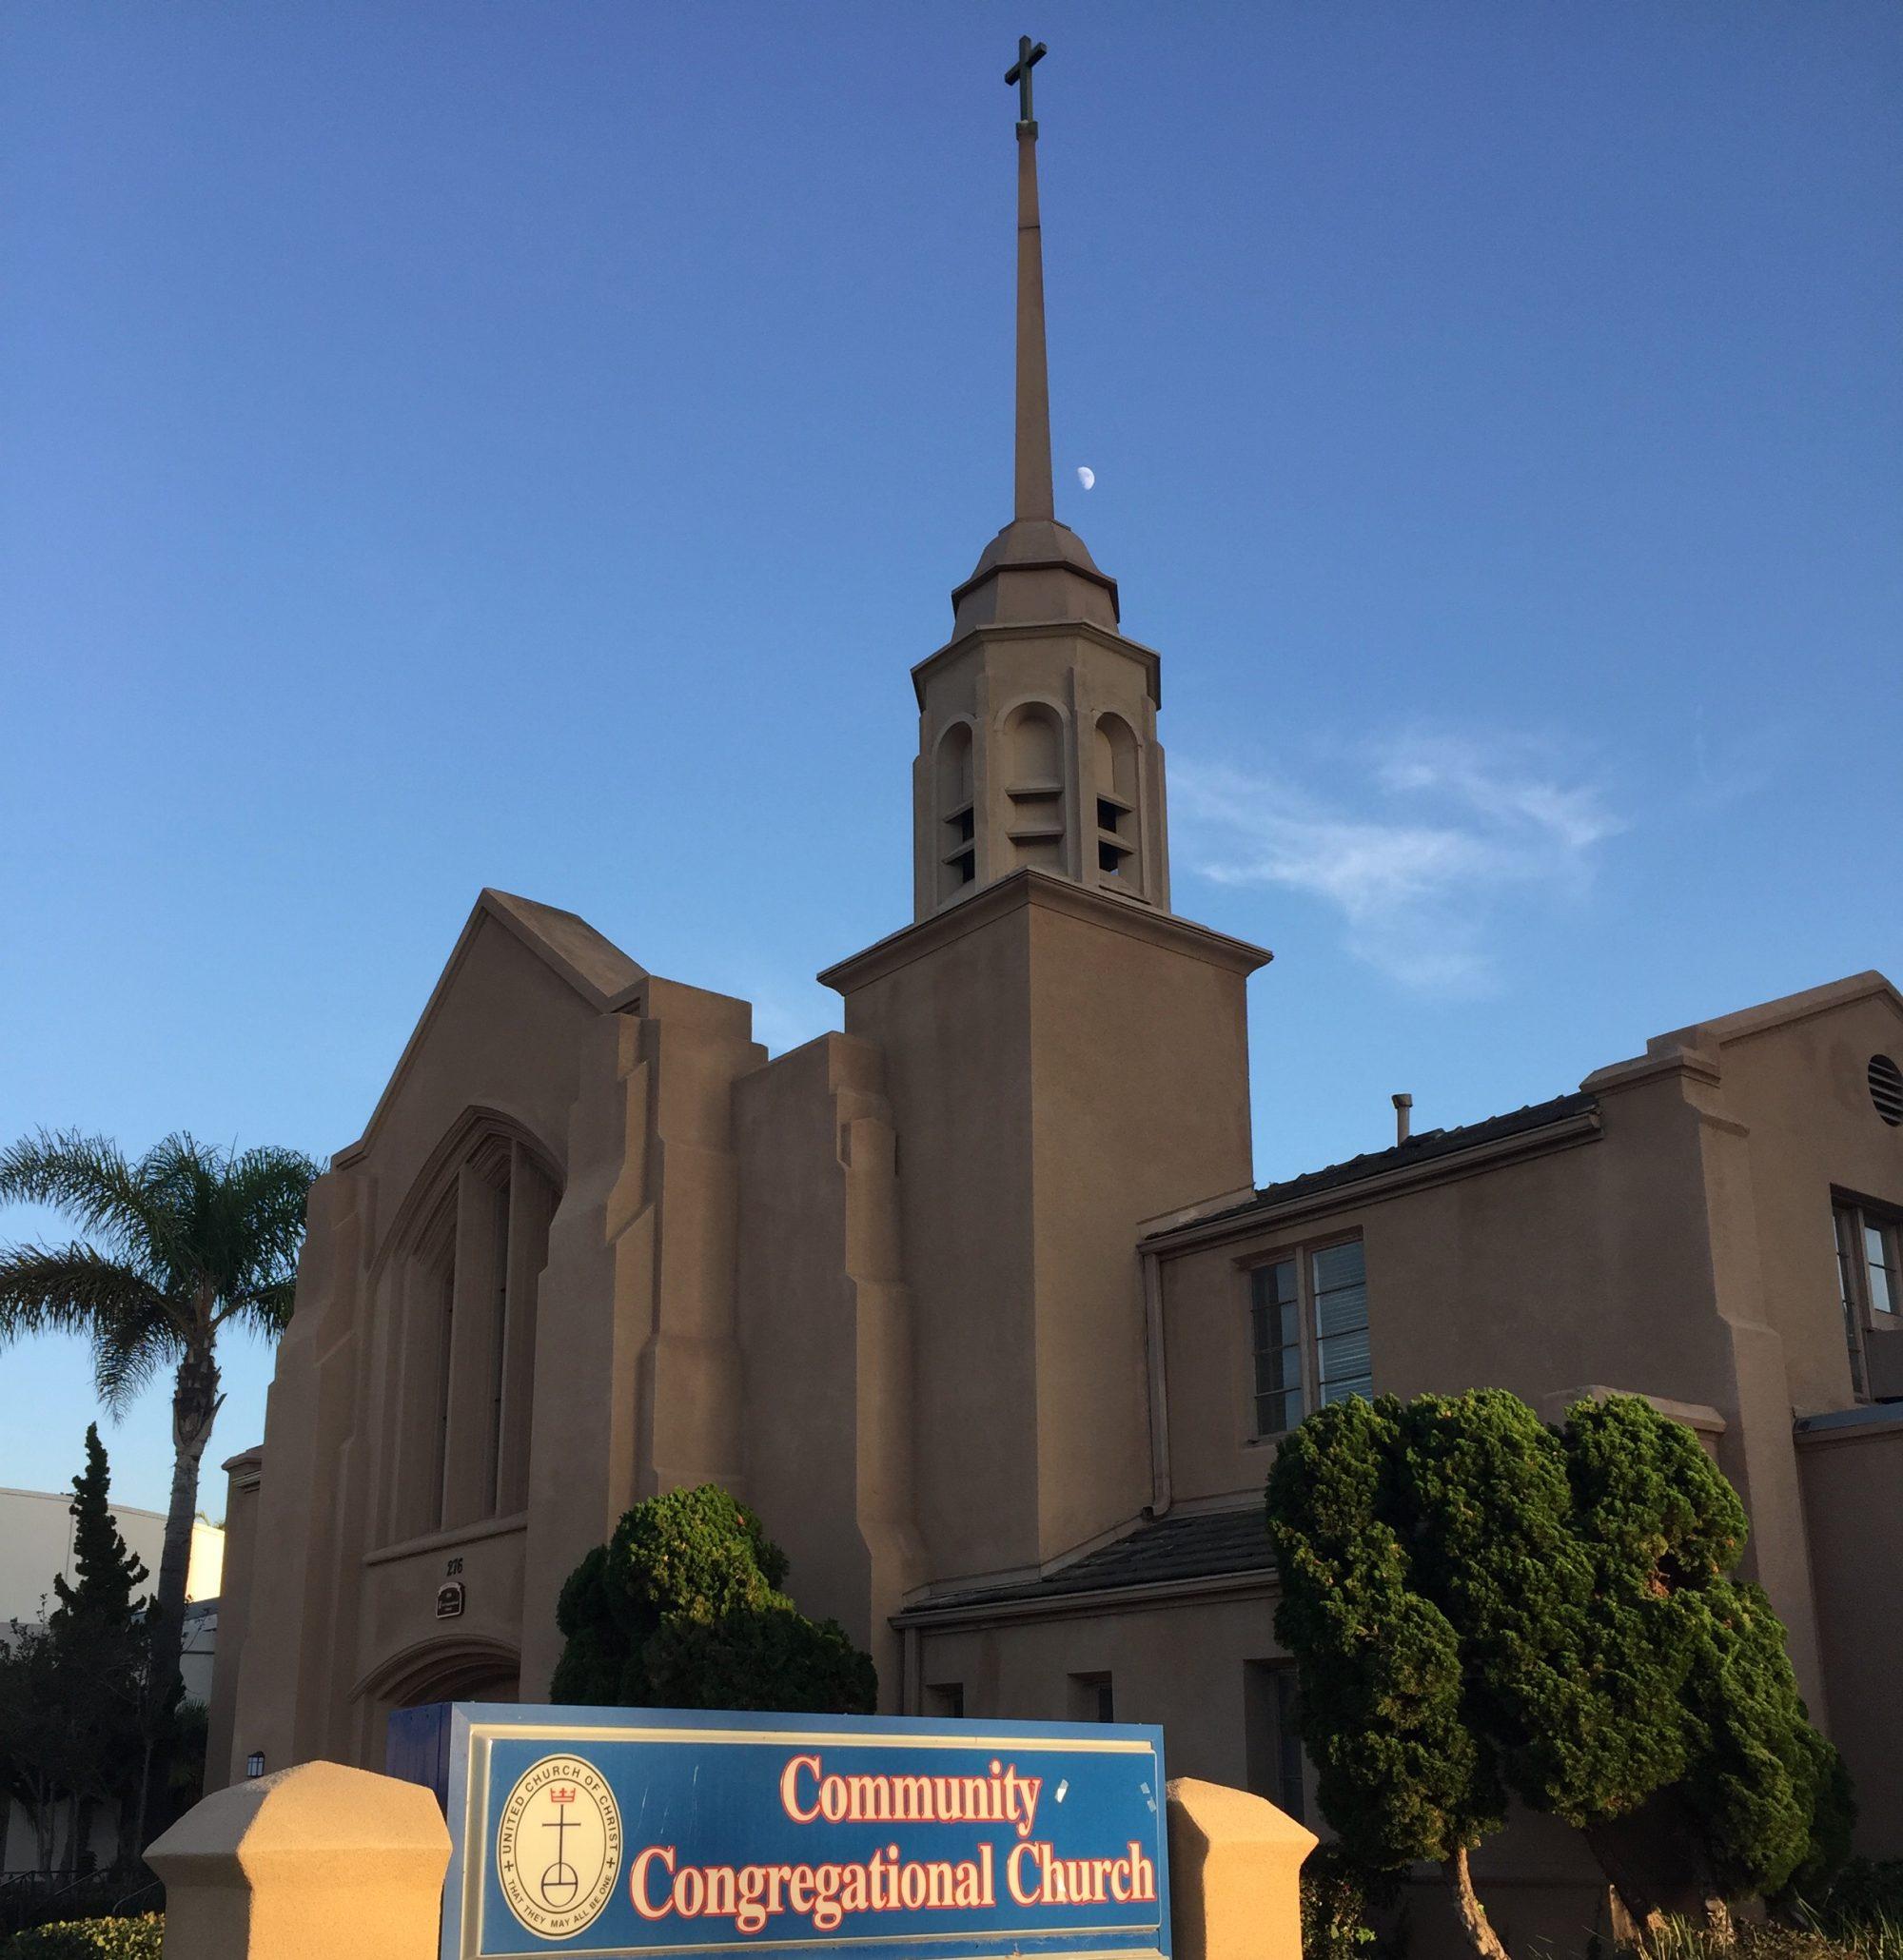 Community Congregational Church of Chula Vista UCC